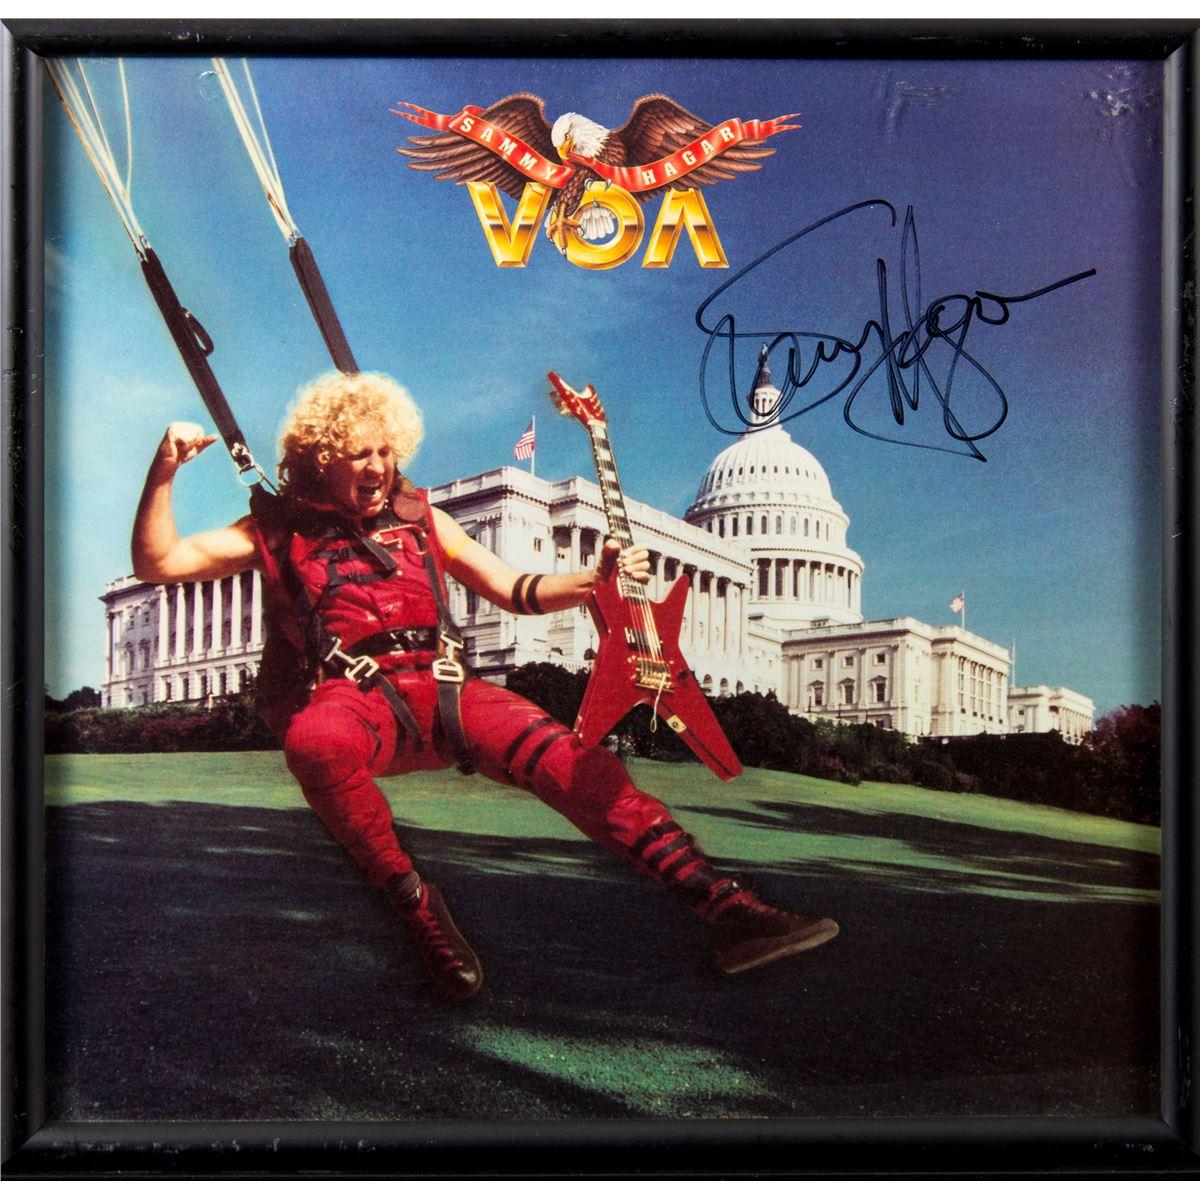 Sammy Hagar Autographed Voa Album Framed